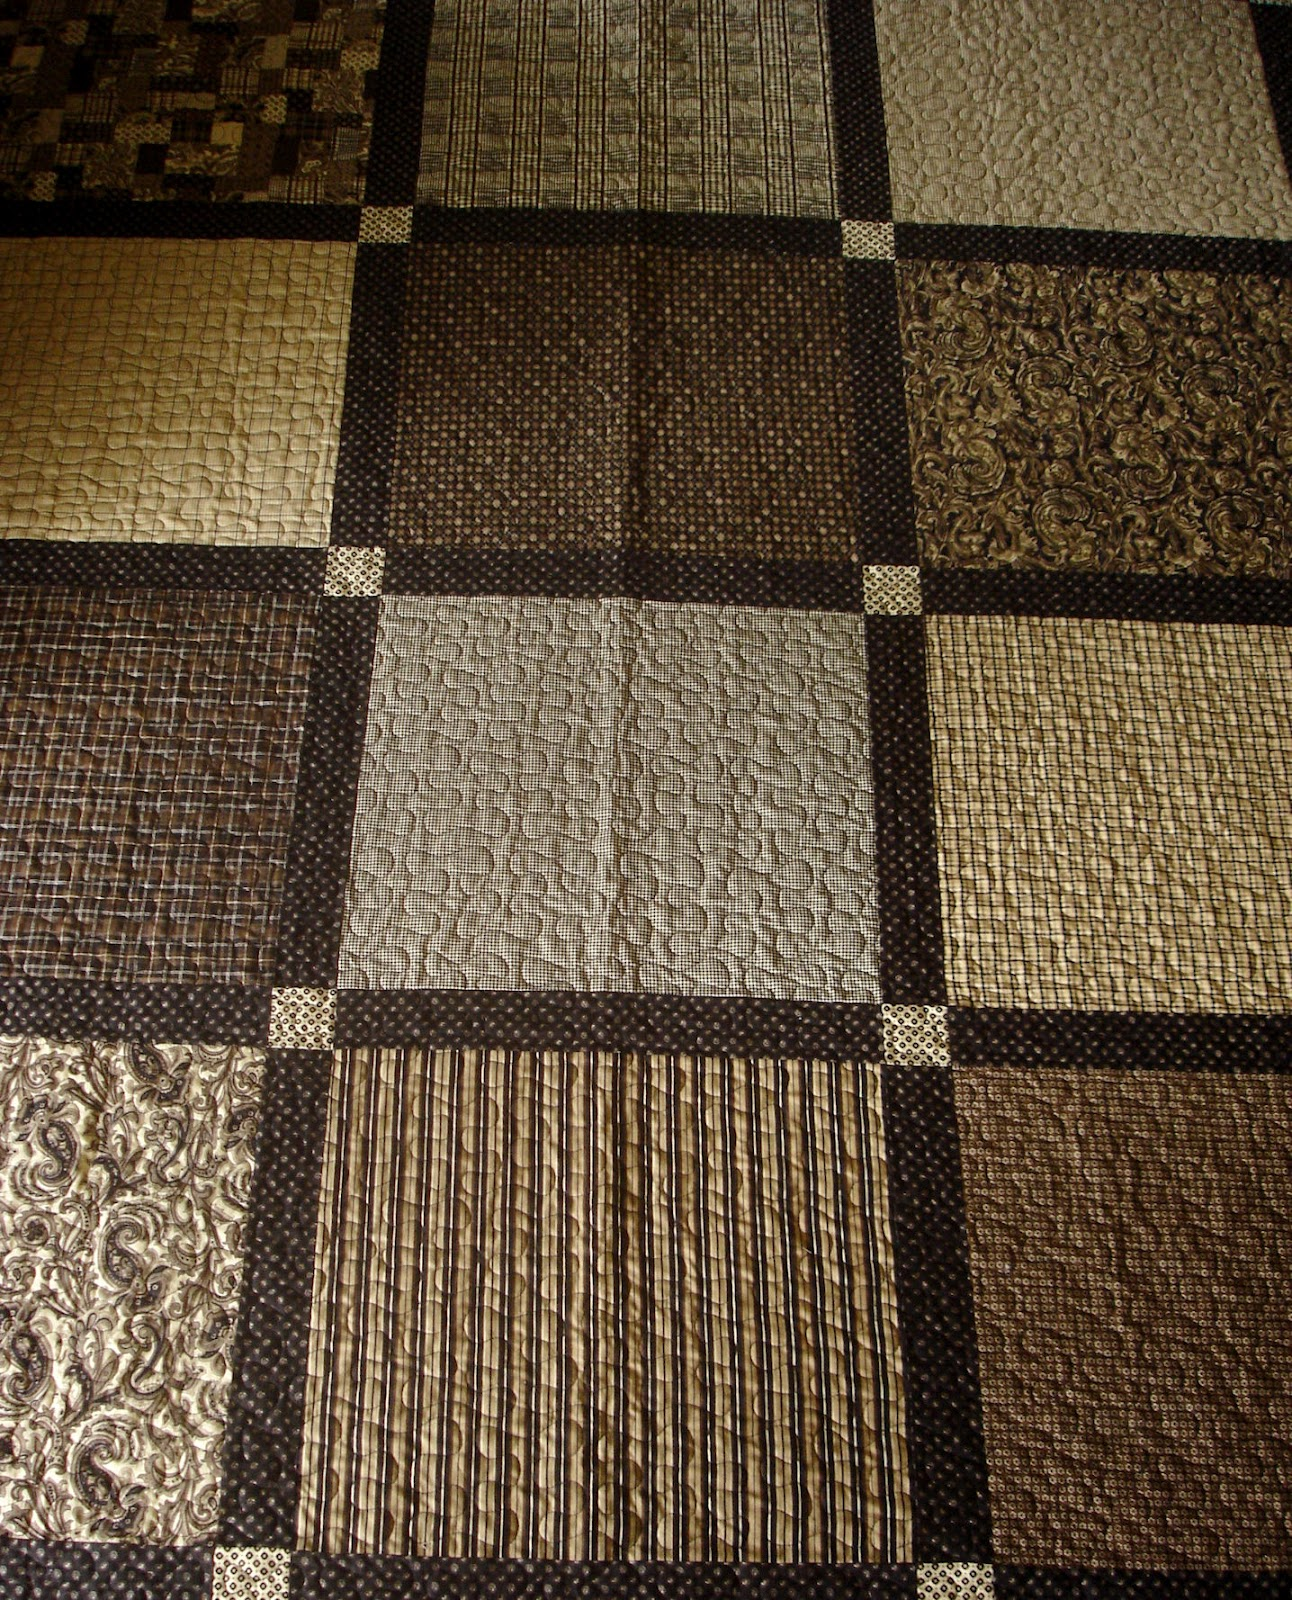 Quilt Patterns For A Man : Mugwa Cottage: Quilts for Men